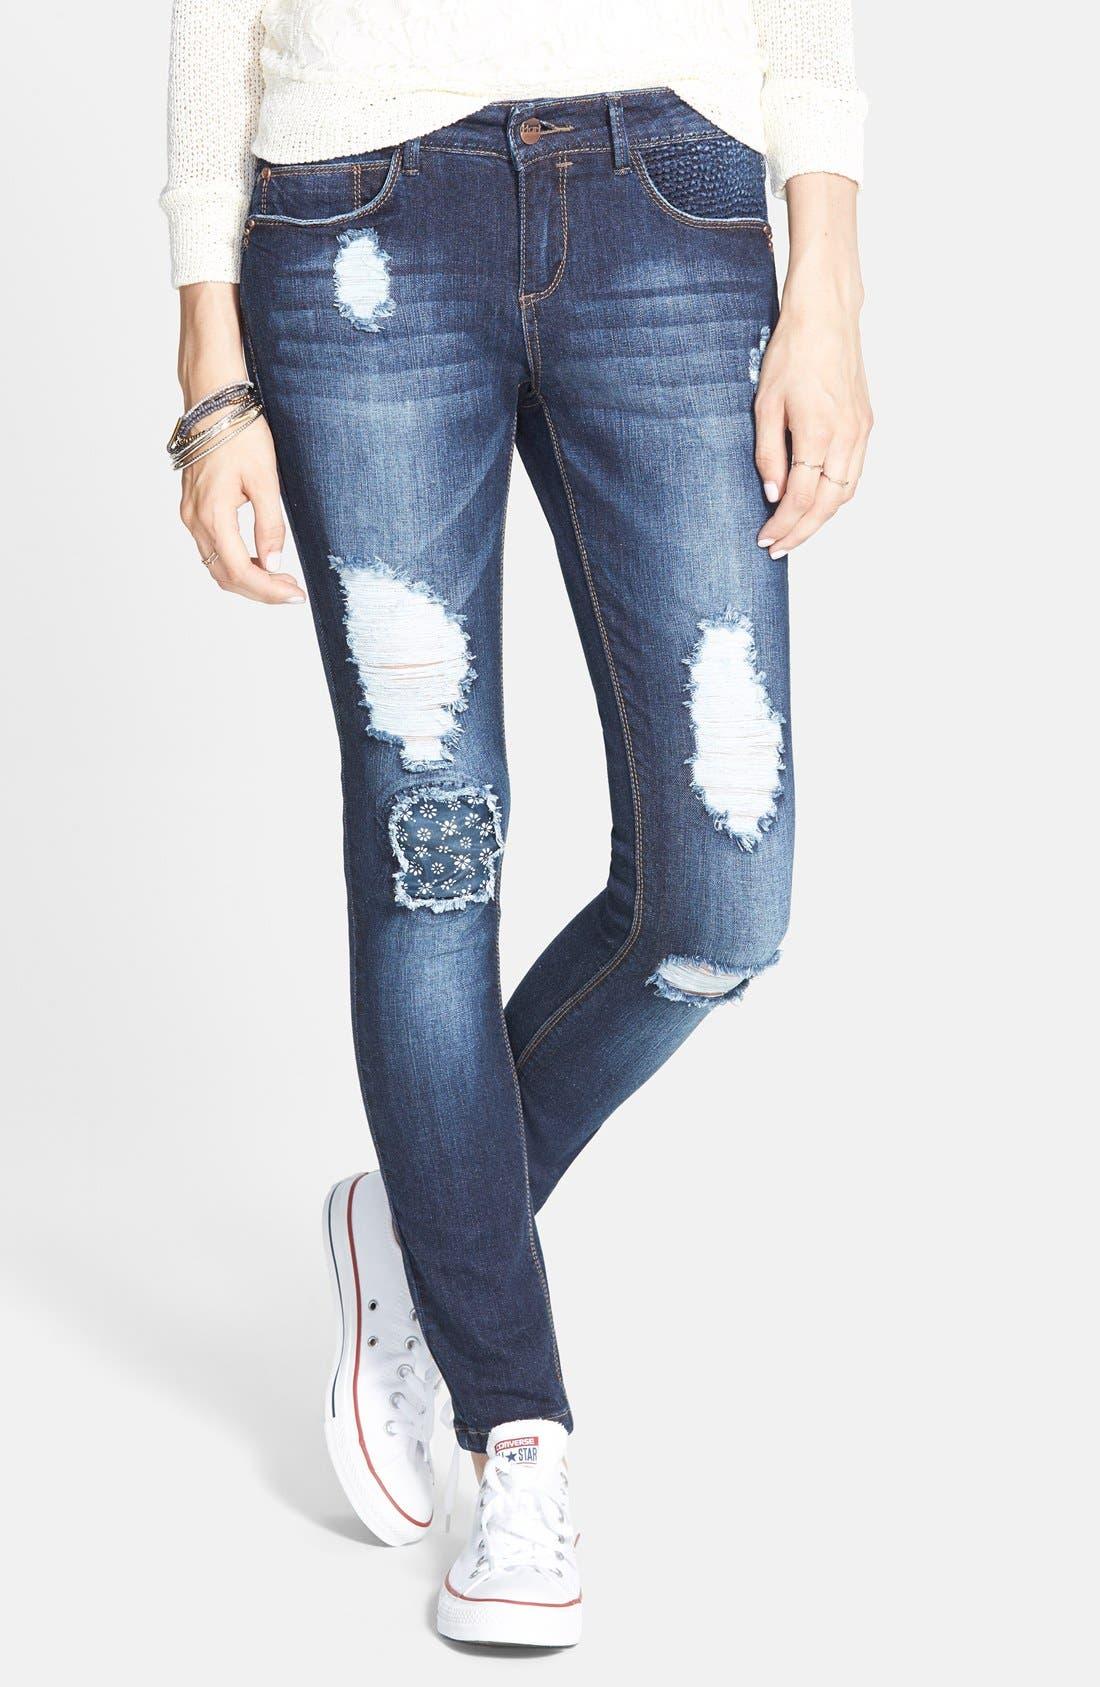 Alternate Image 1 Selected - HART Denim 'Leigh' Destroyed Patched Skinny Jeans (Dark Wash)